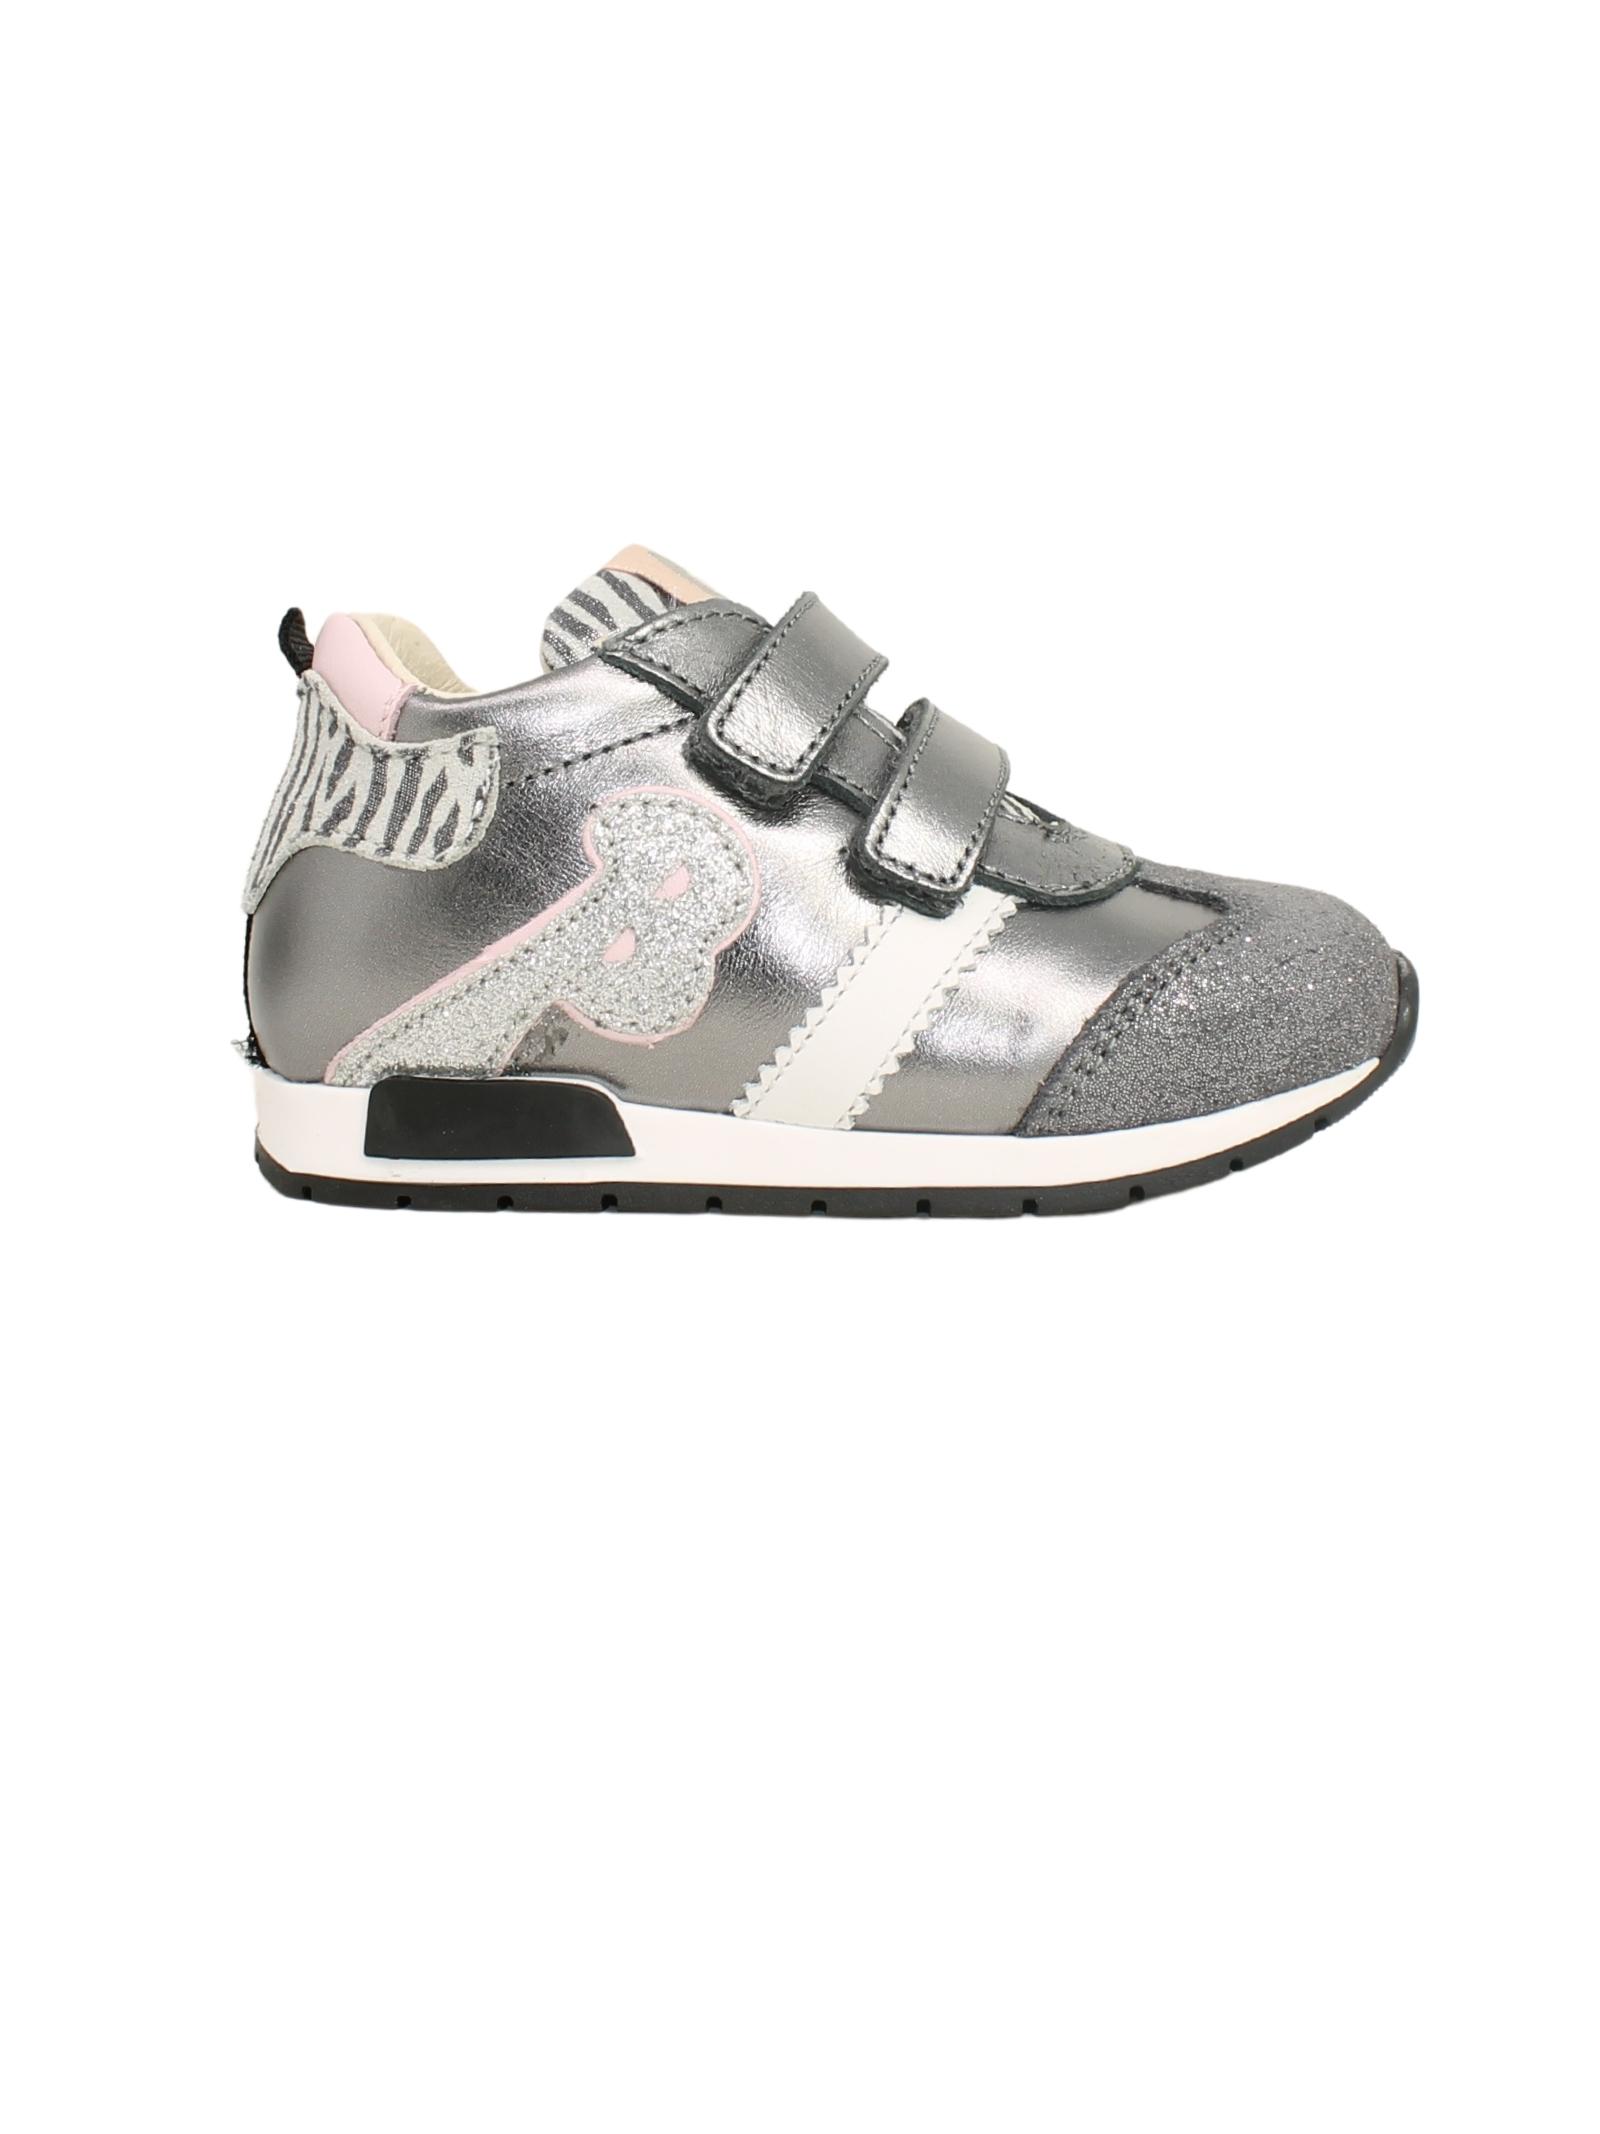 Low Sneakers in Lurex Girl BALDUCCI | Sneakers | CSPO4853ACCIAIO